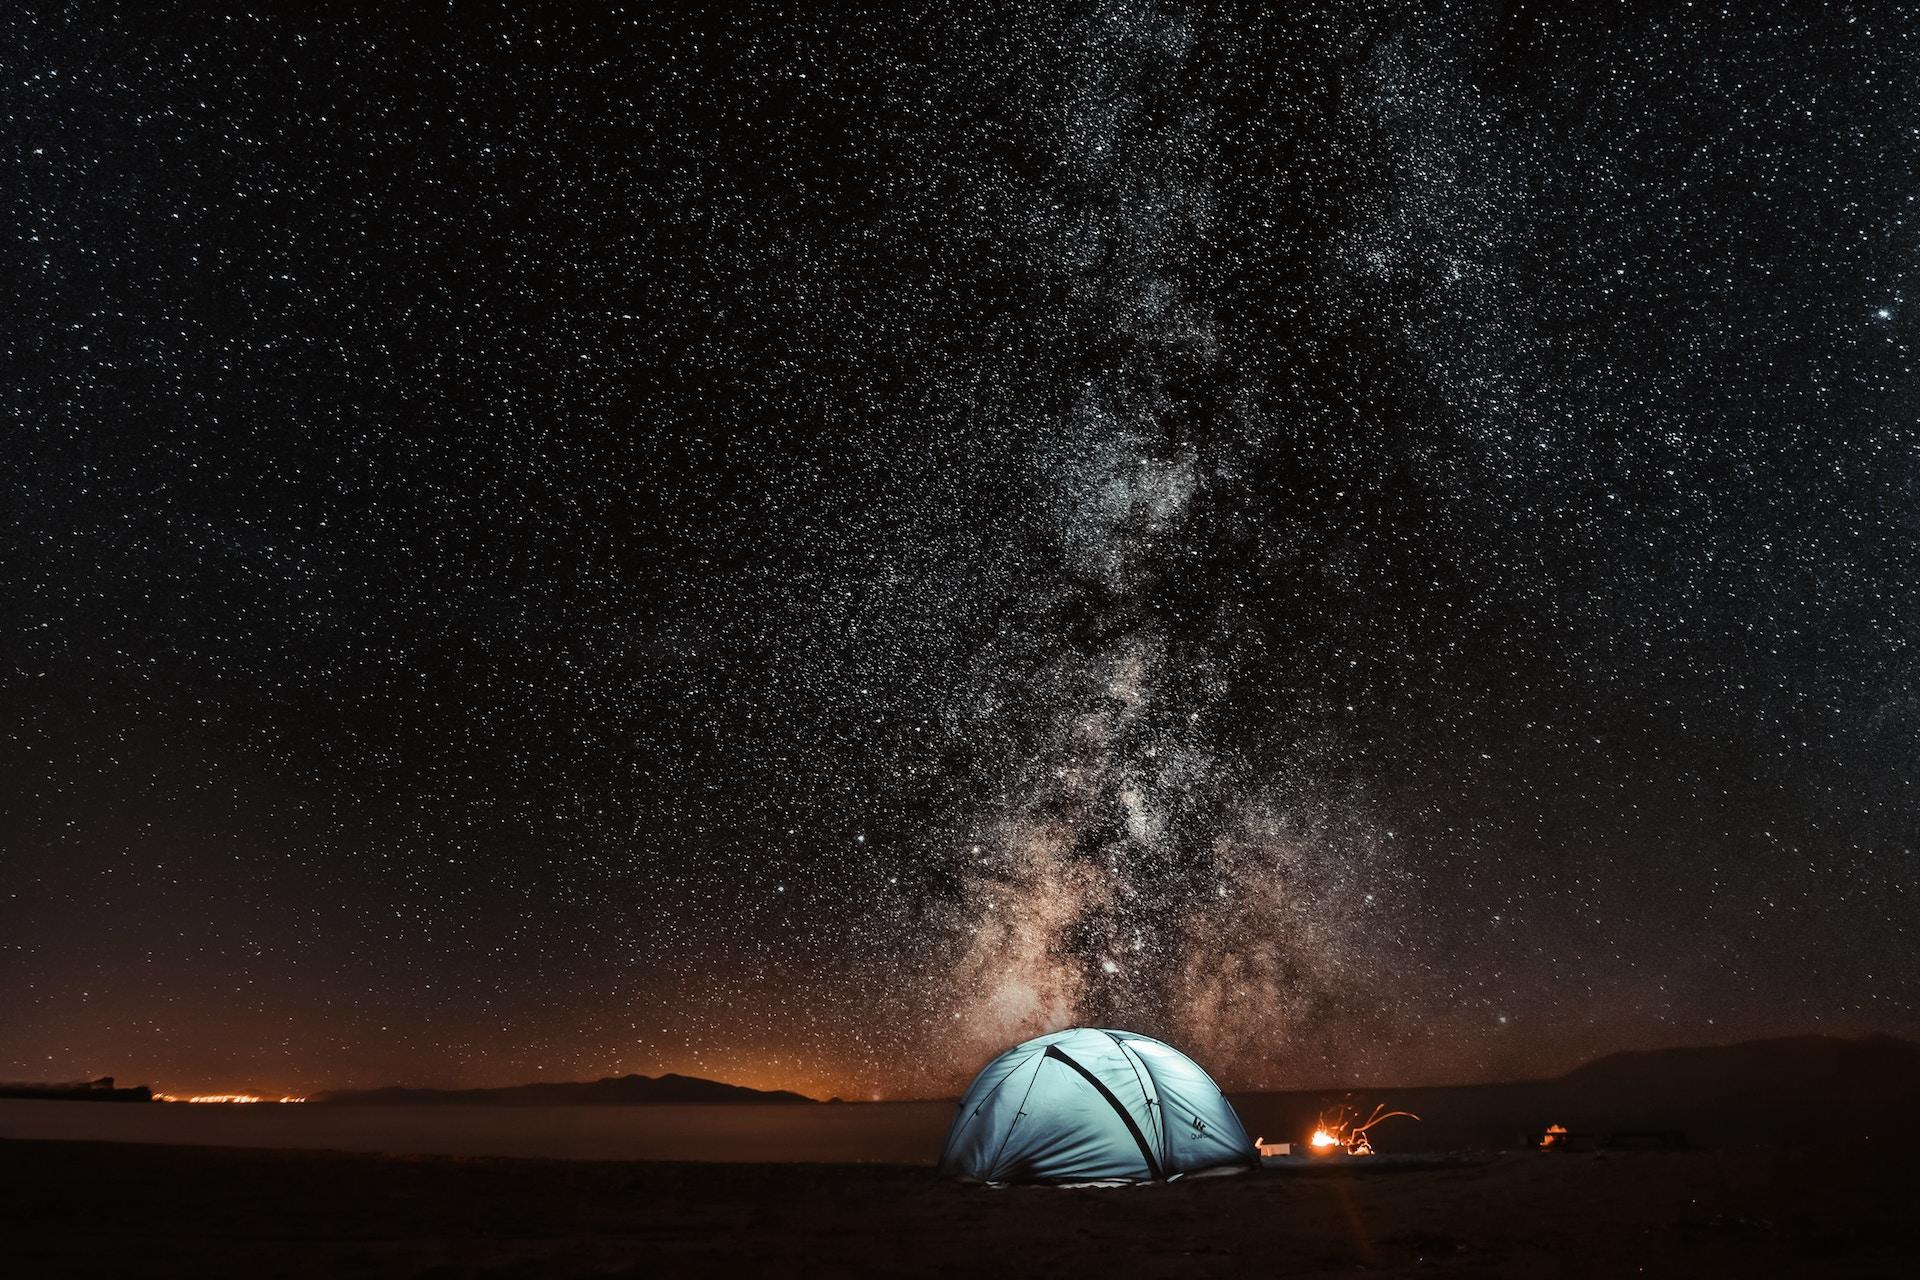 tent under star filled night sky